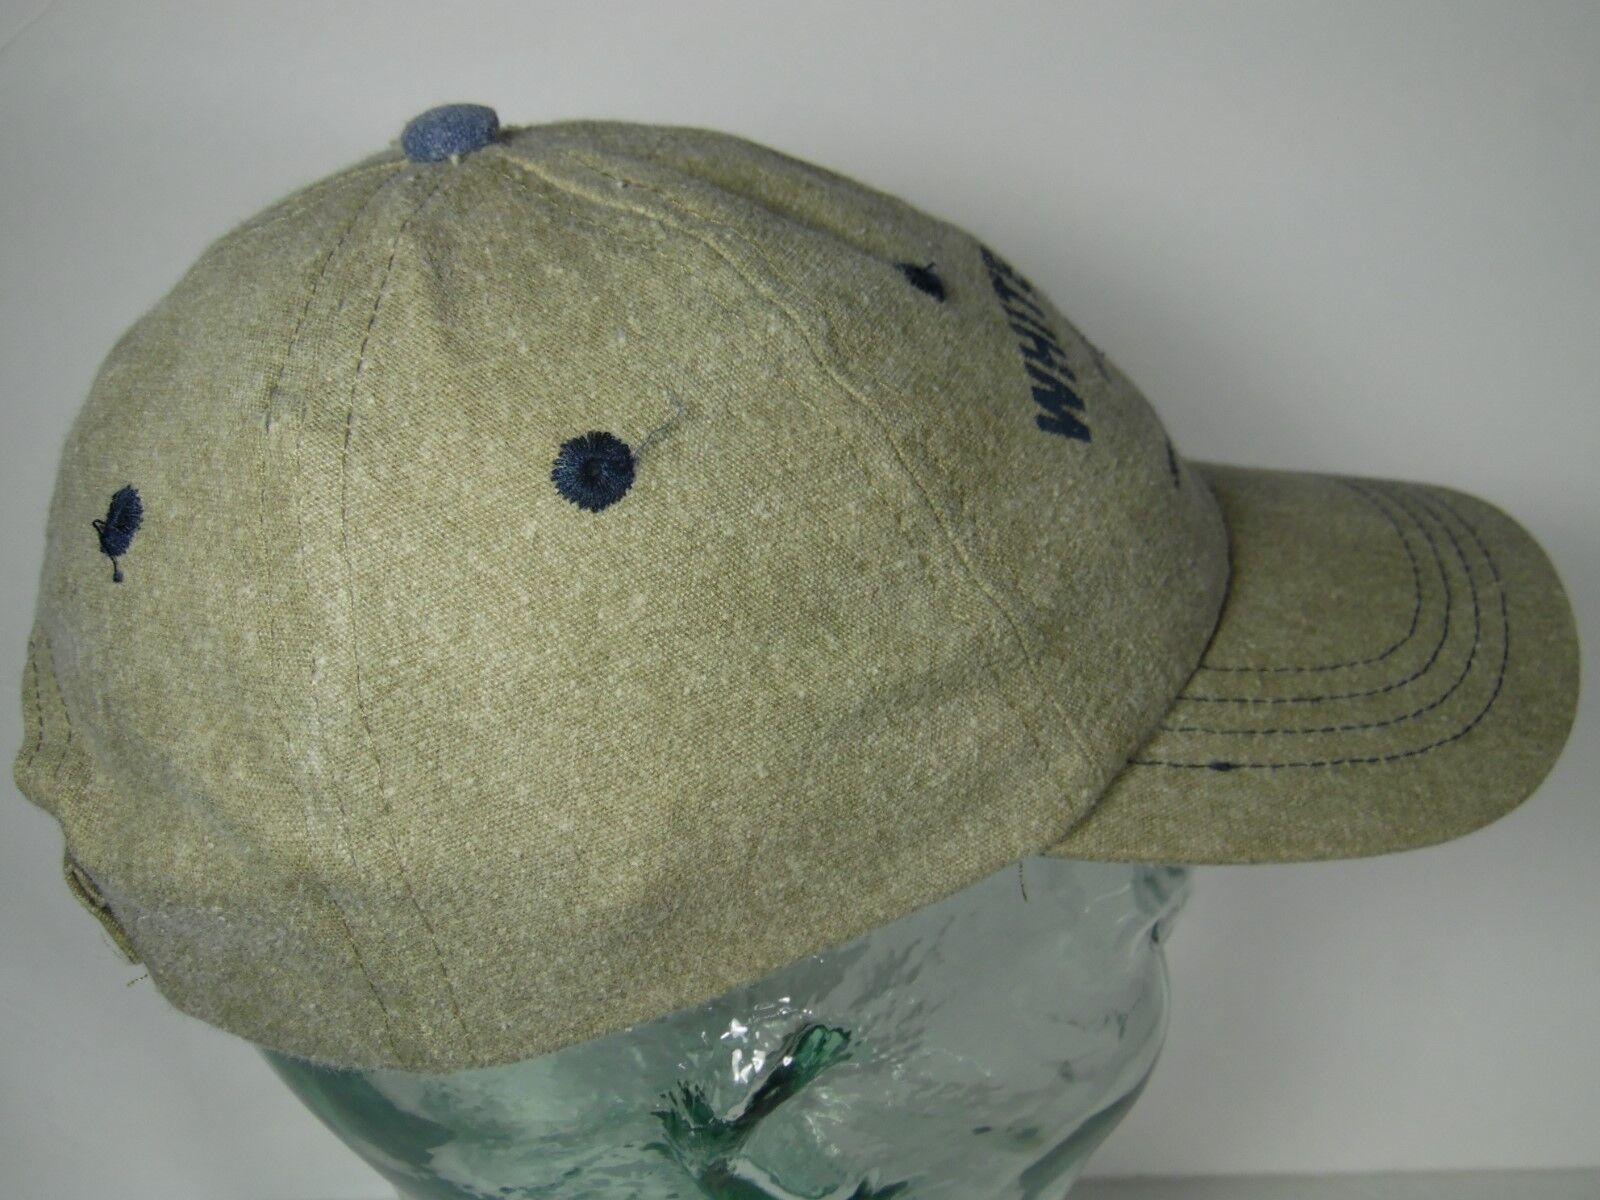 WHITE WHITE WHITE WATER SILVER DOLLAR CITY Branson Missouri CHILD SIZE ADJUSTABLE HAT CAP f1907a